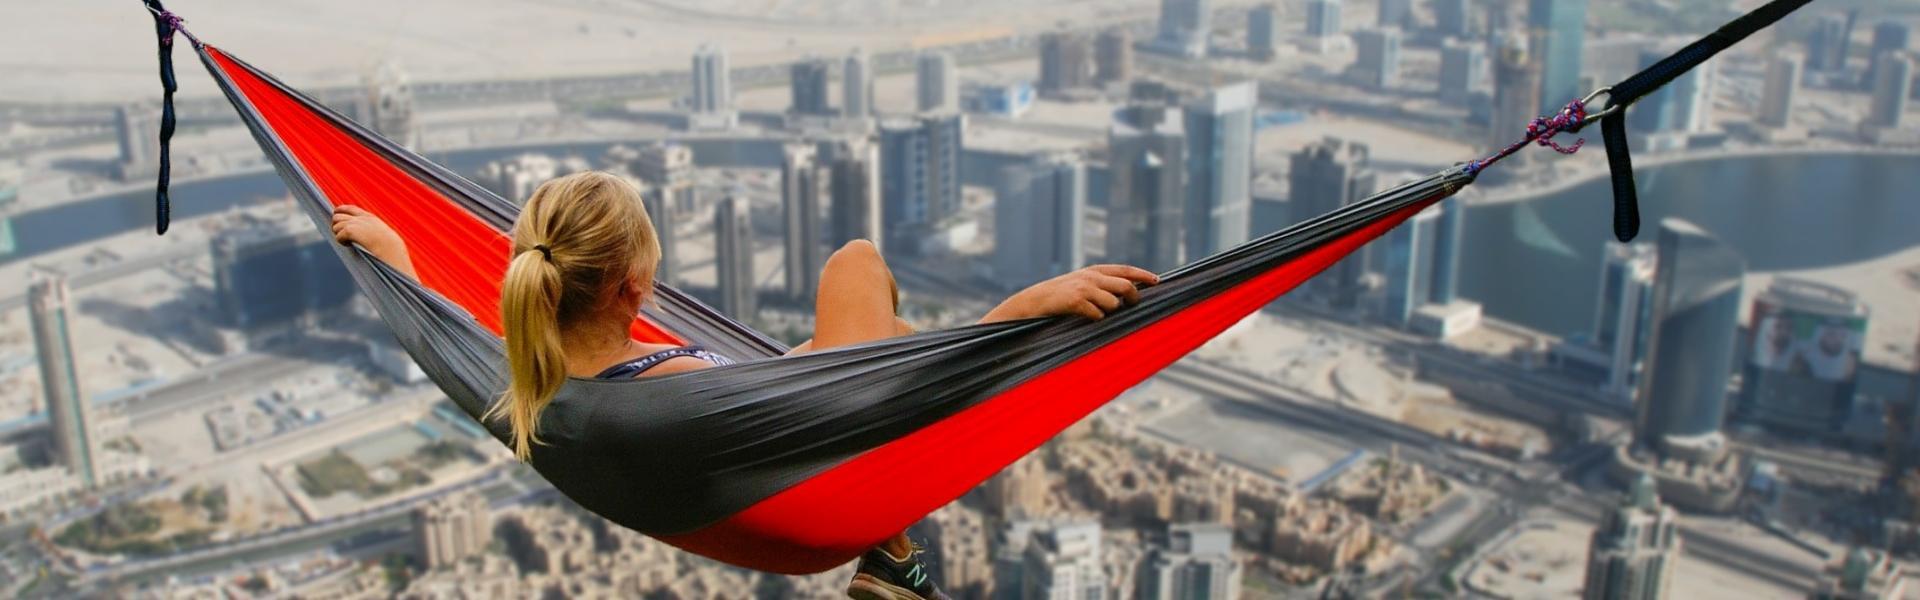 Three Crucial Insights Into Consumer Behavior in the UAE